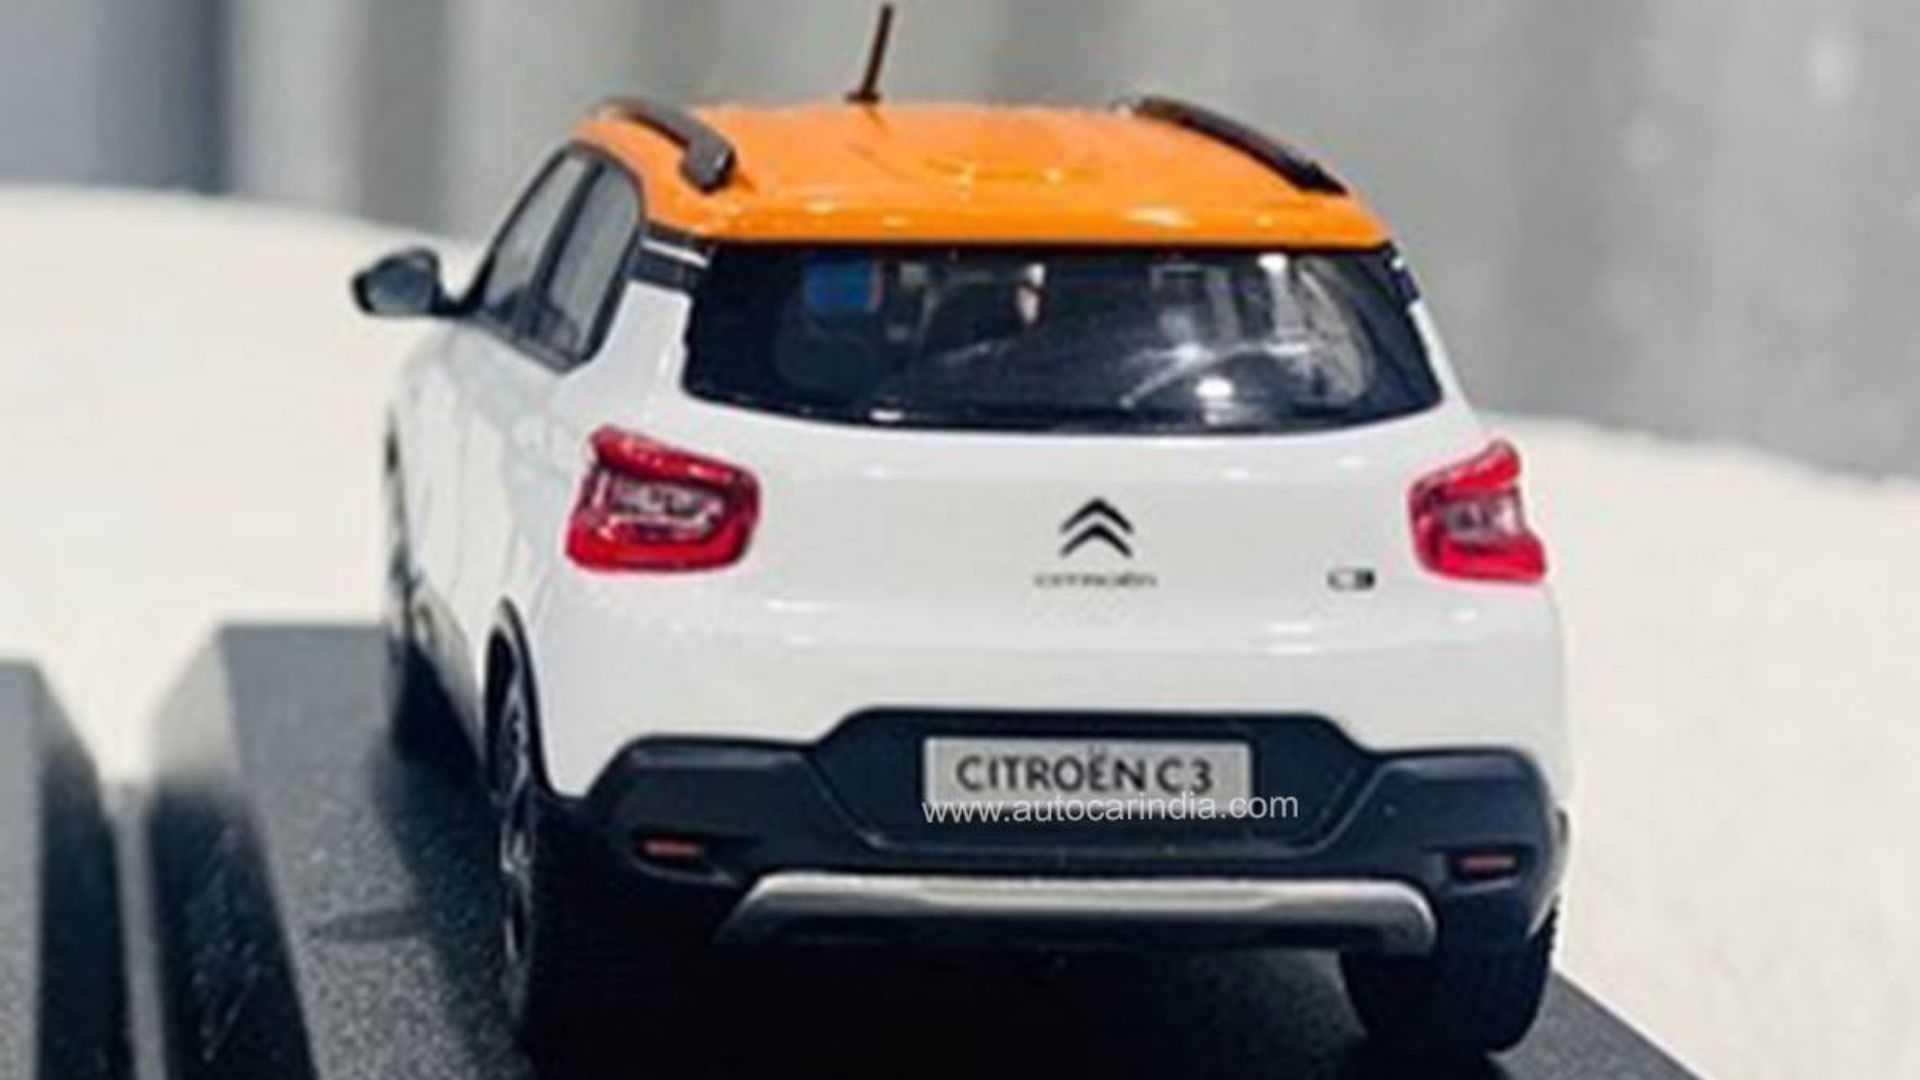 Nuevo Citroën C3 miniatura